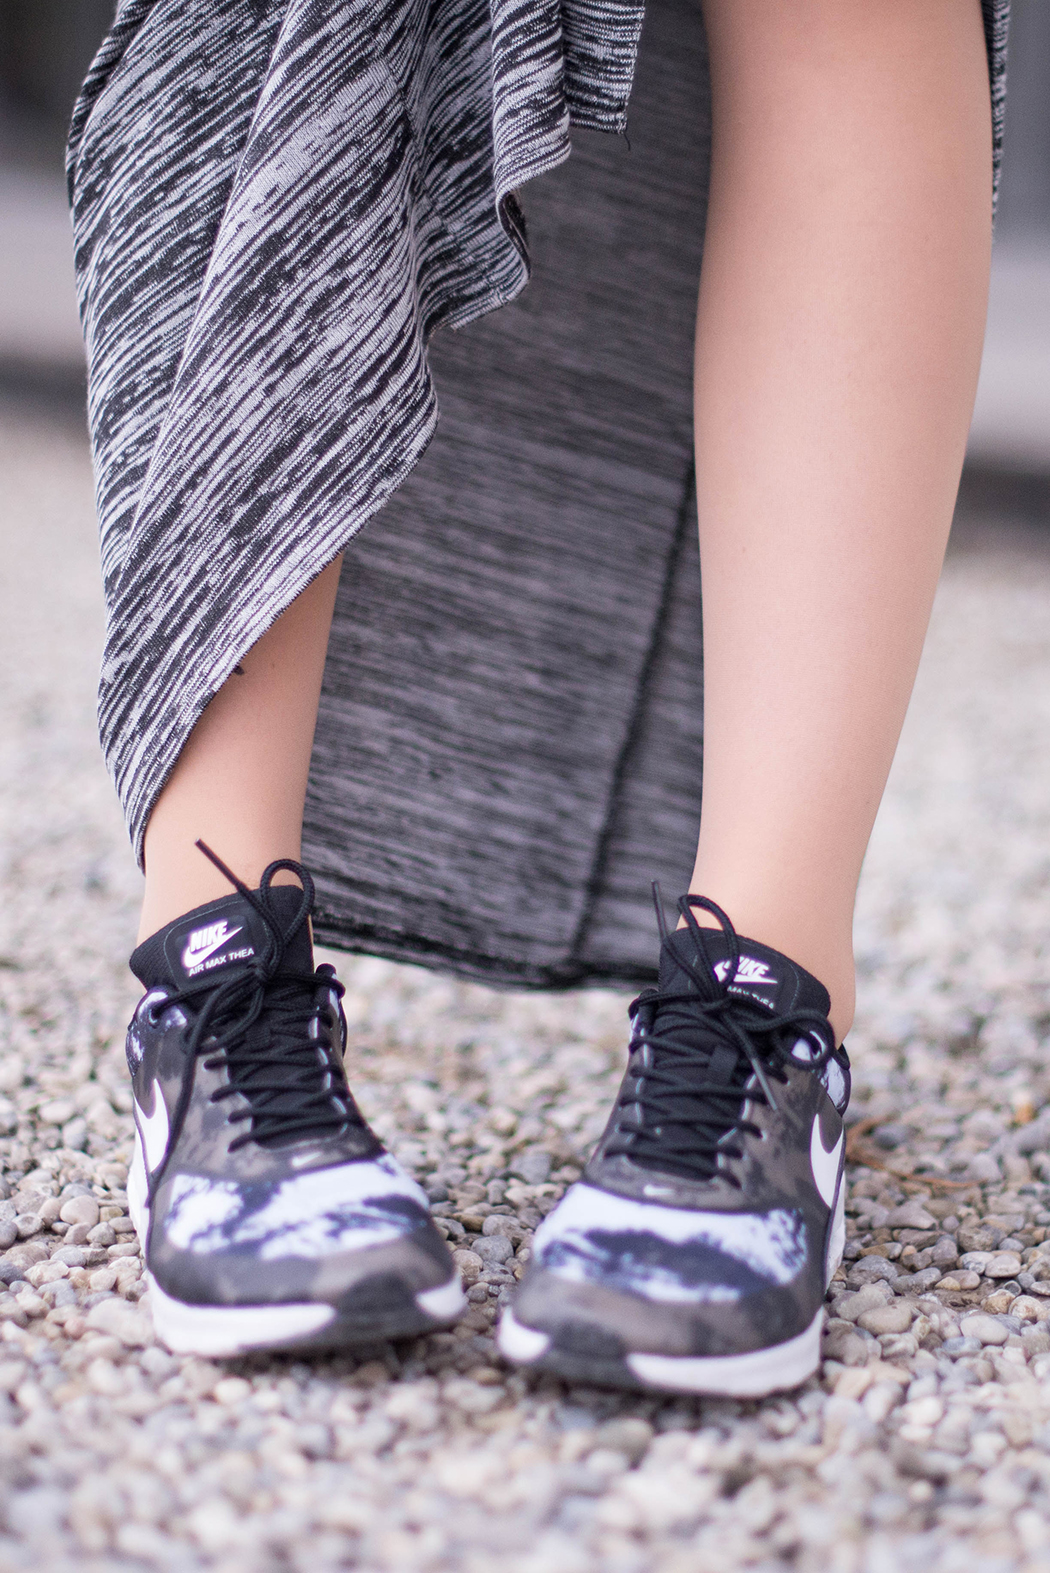 Fashionblogger-München-Fashionblog-Deutschland-Lindarella-Fitnessblogger-Nike-Air-Max-Military-Engelhorn-Chloe-Marcie-weinrot-rot-Crop-Top-Strick-6